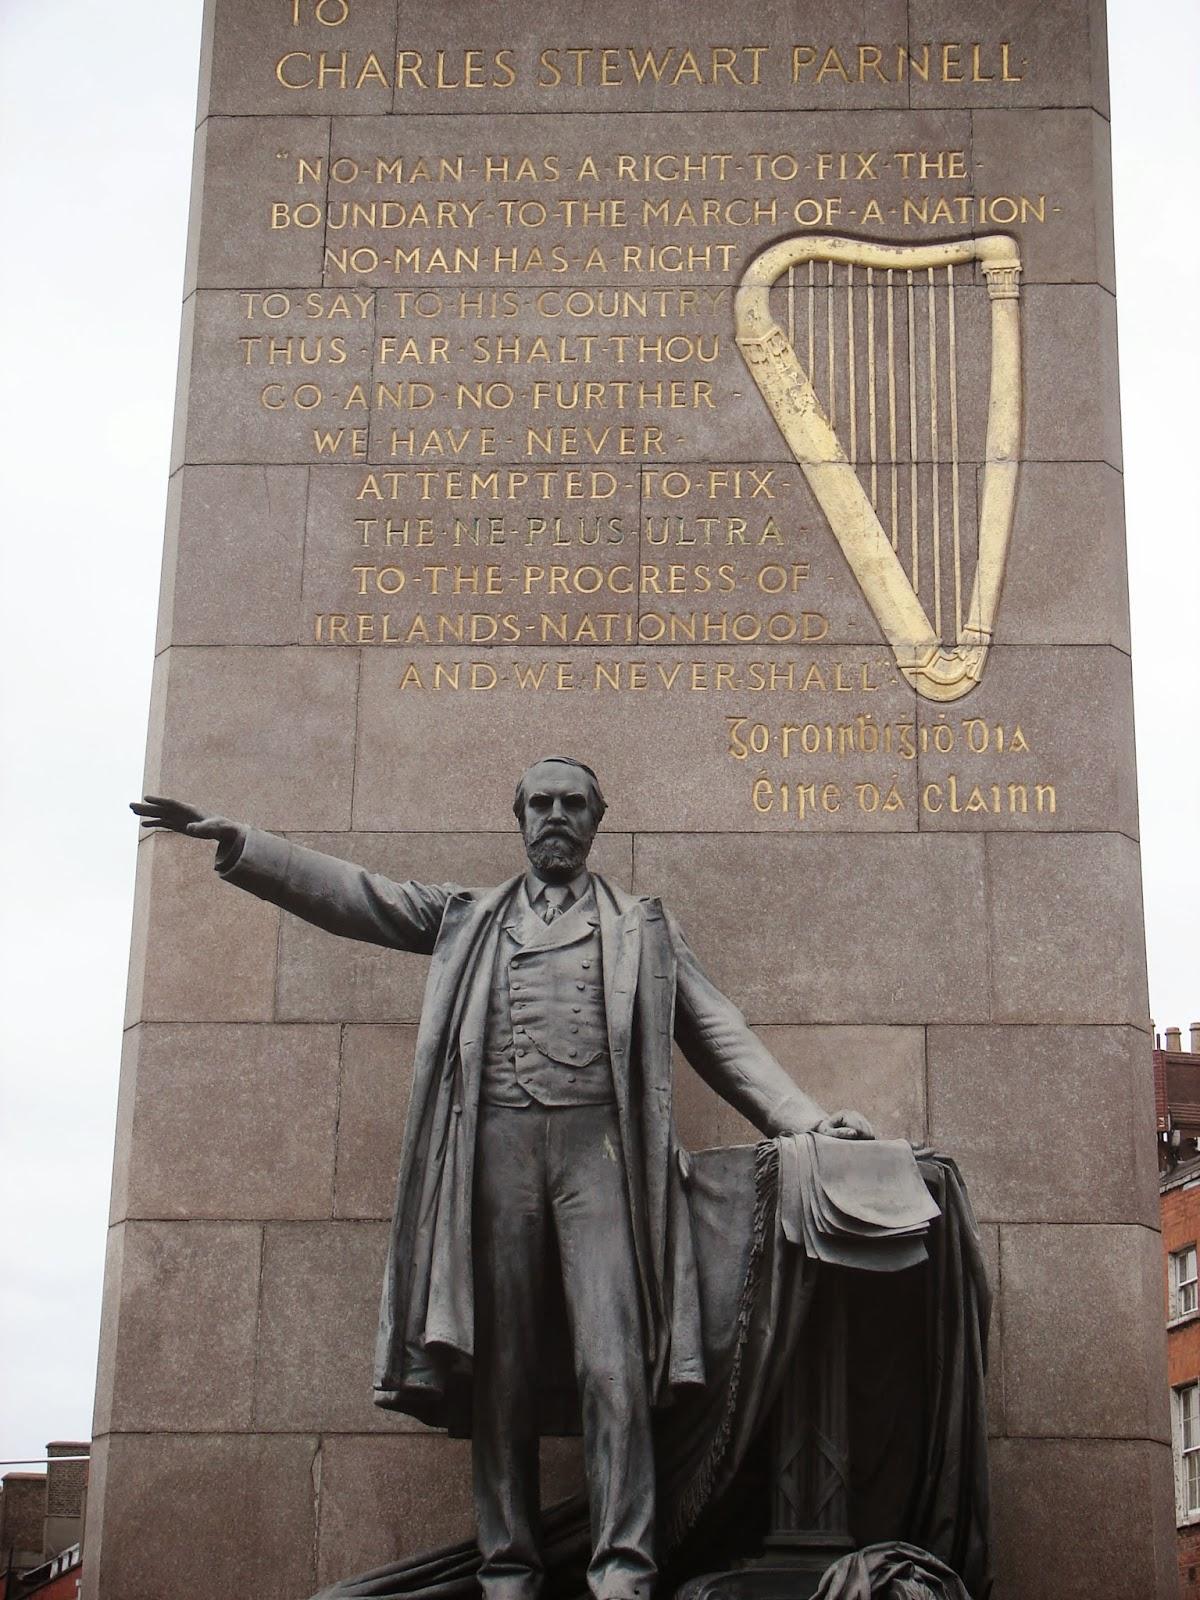 Monumento a Parnell na Ó Connell St. coas frases citadas (XMLS)